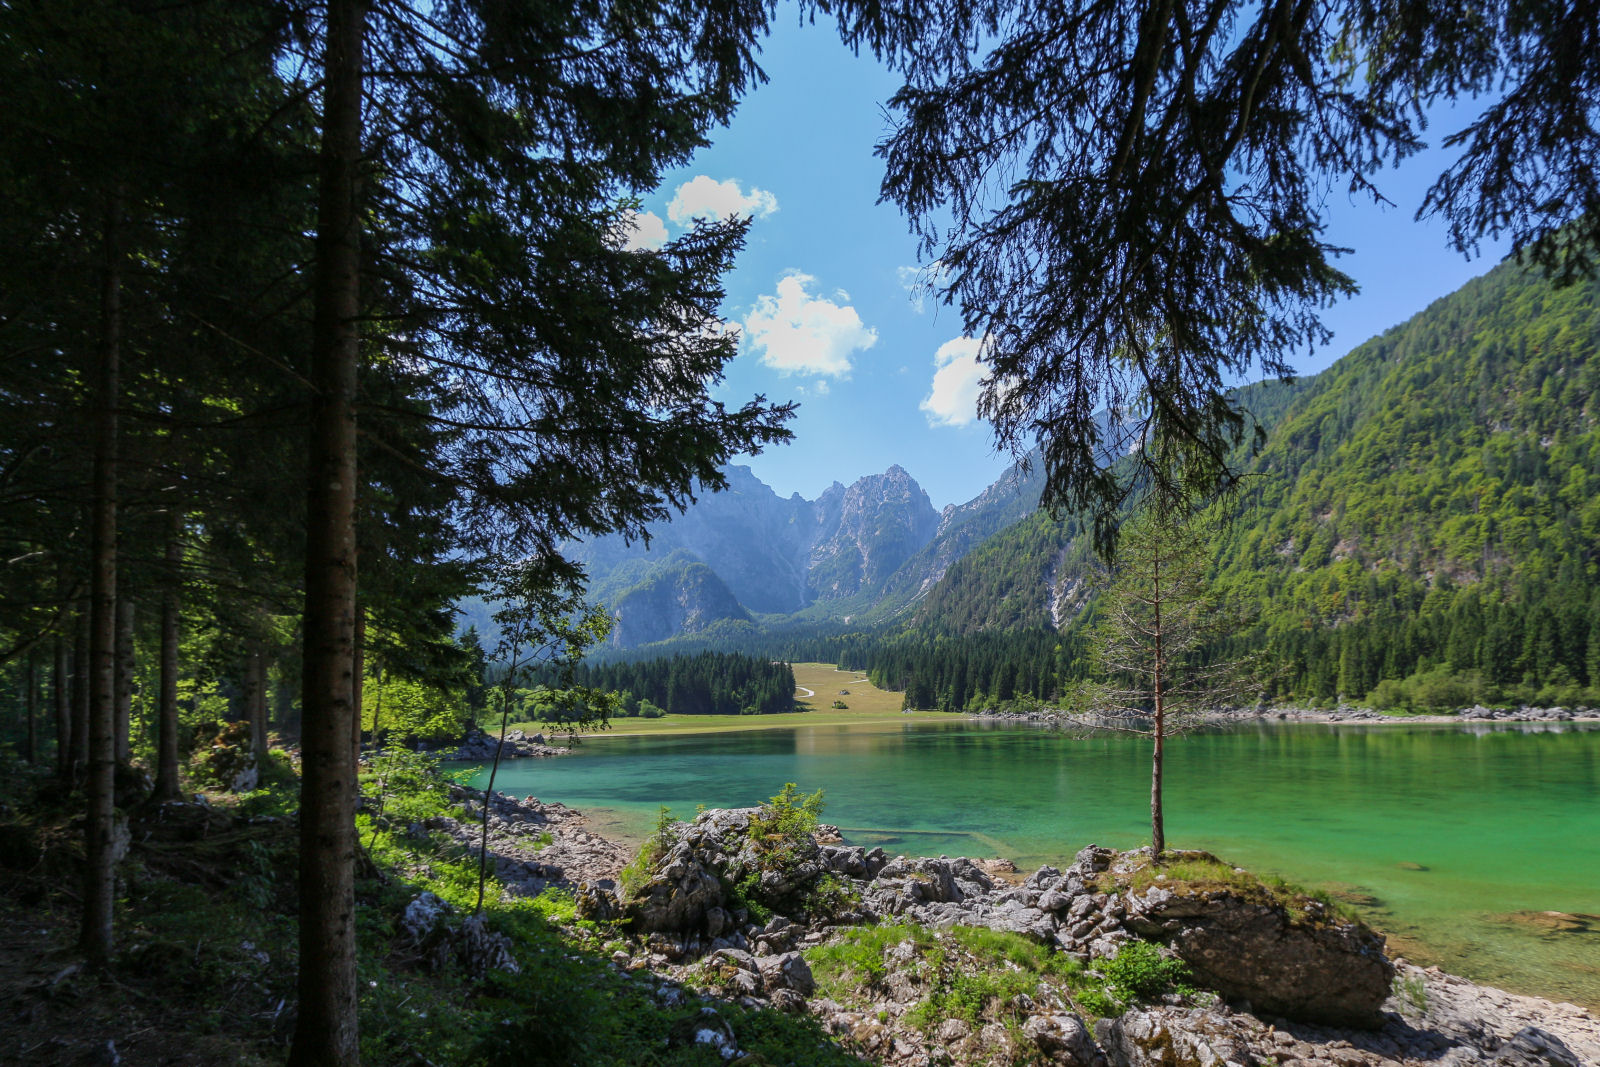 fusine-lakes-05-italy